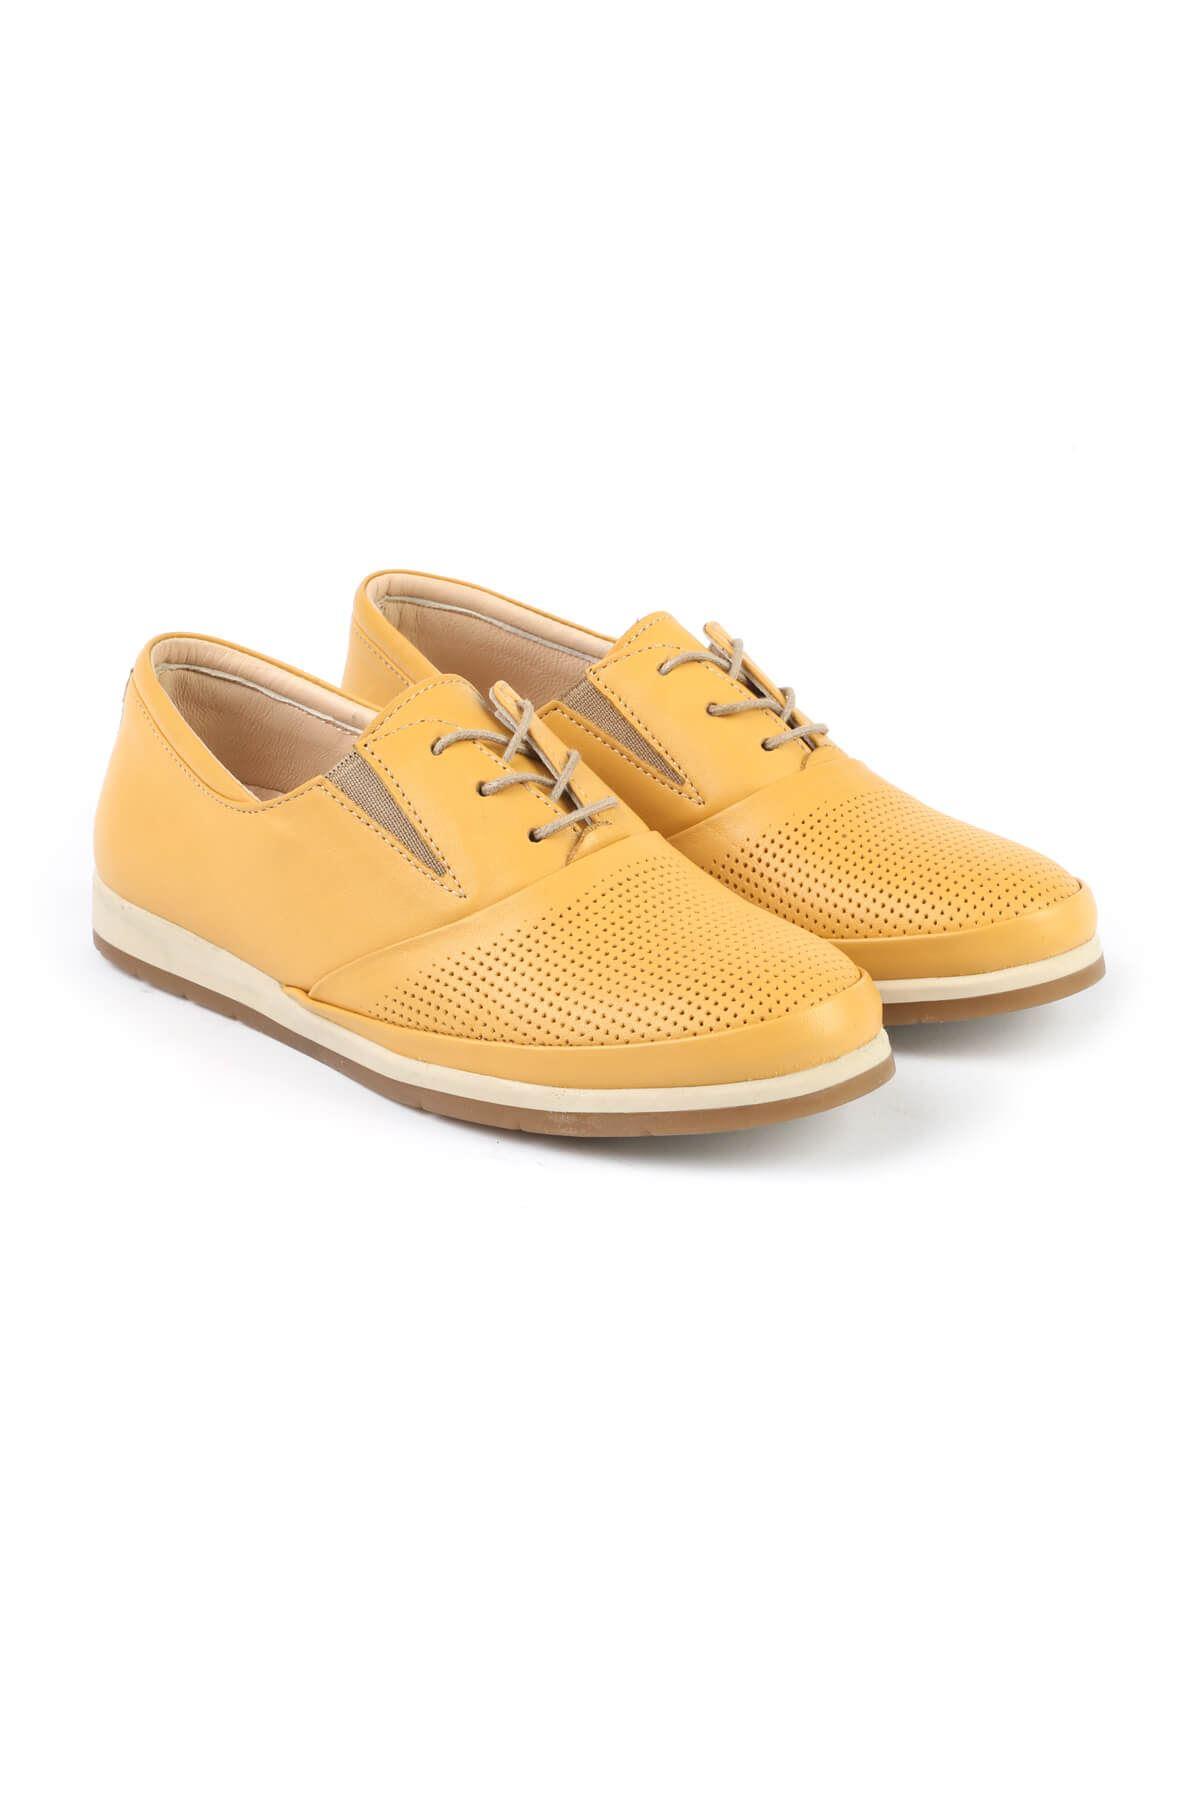 Libero FMS201 Yellow Casual Shoes